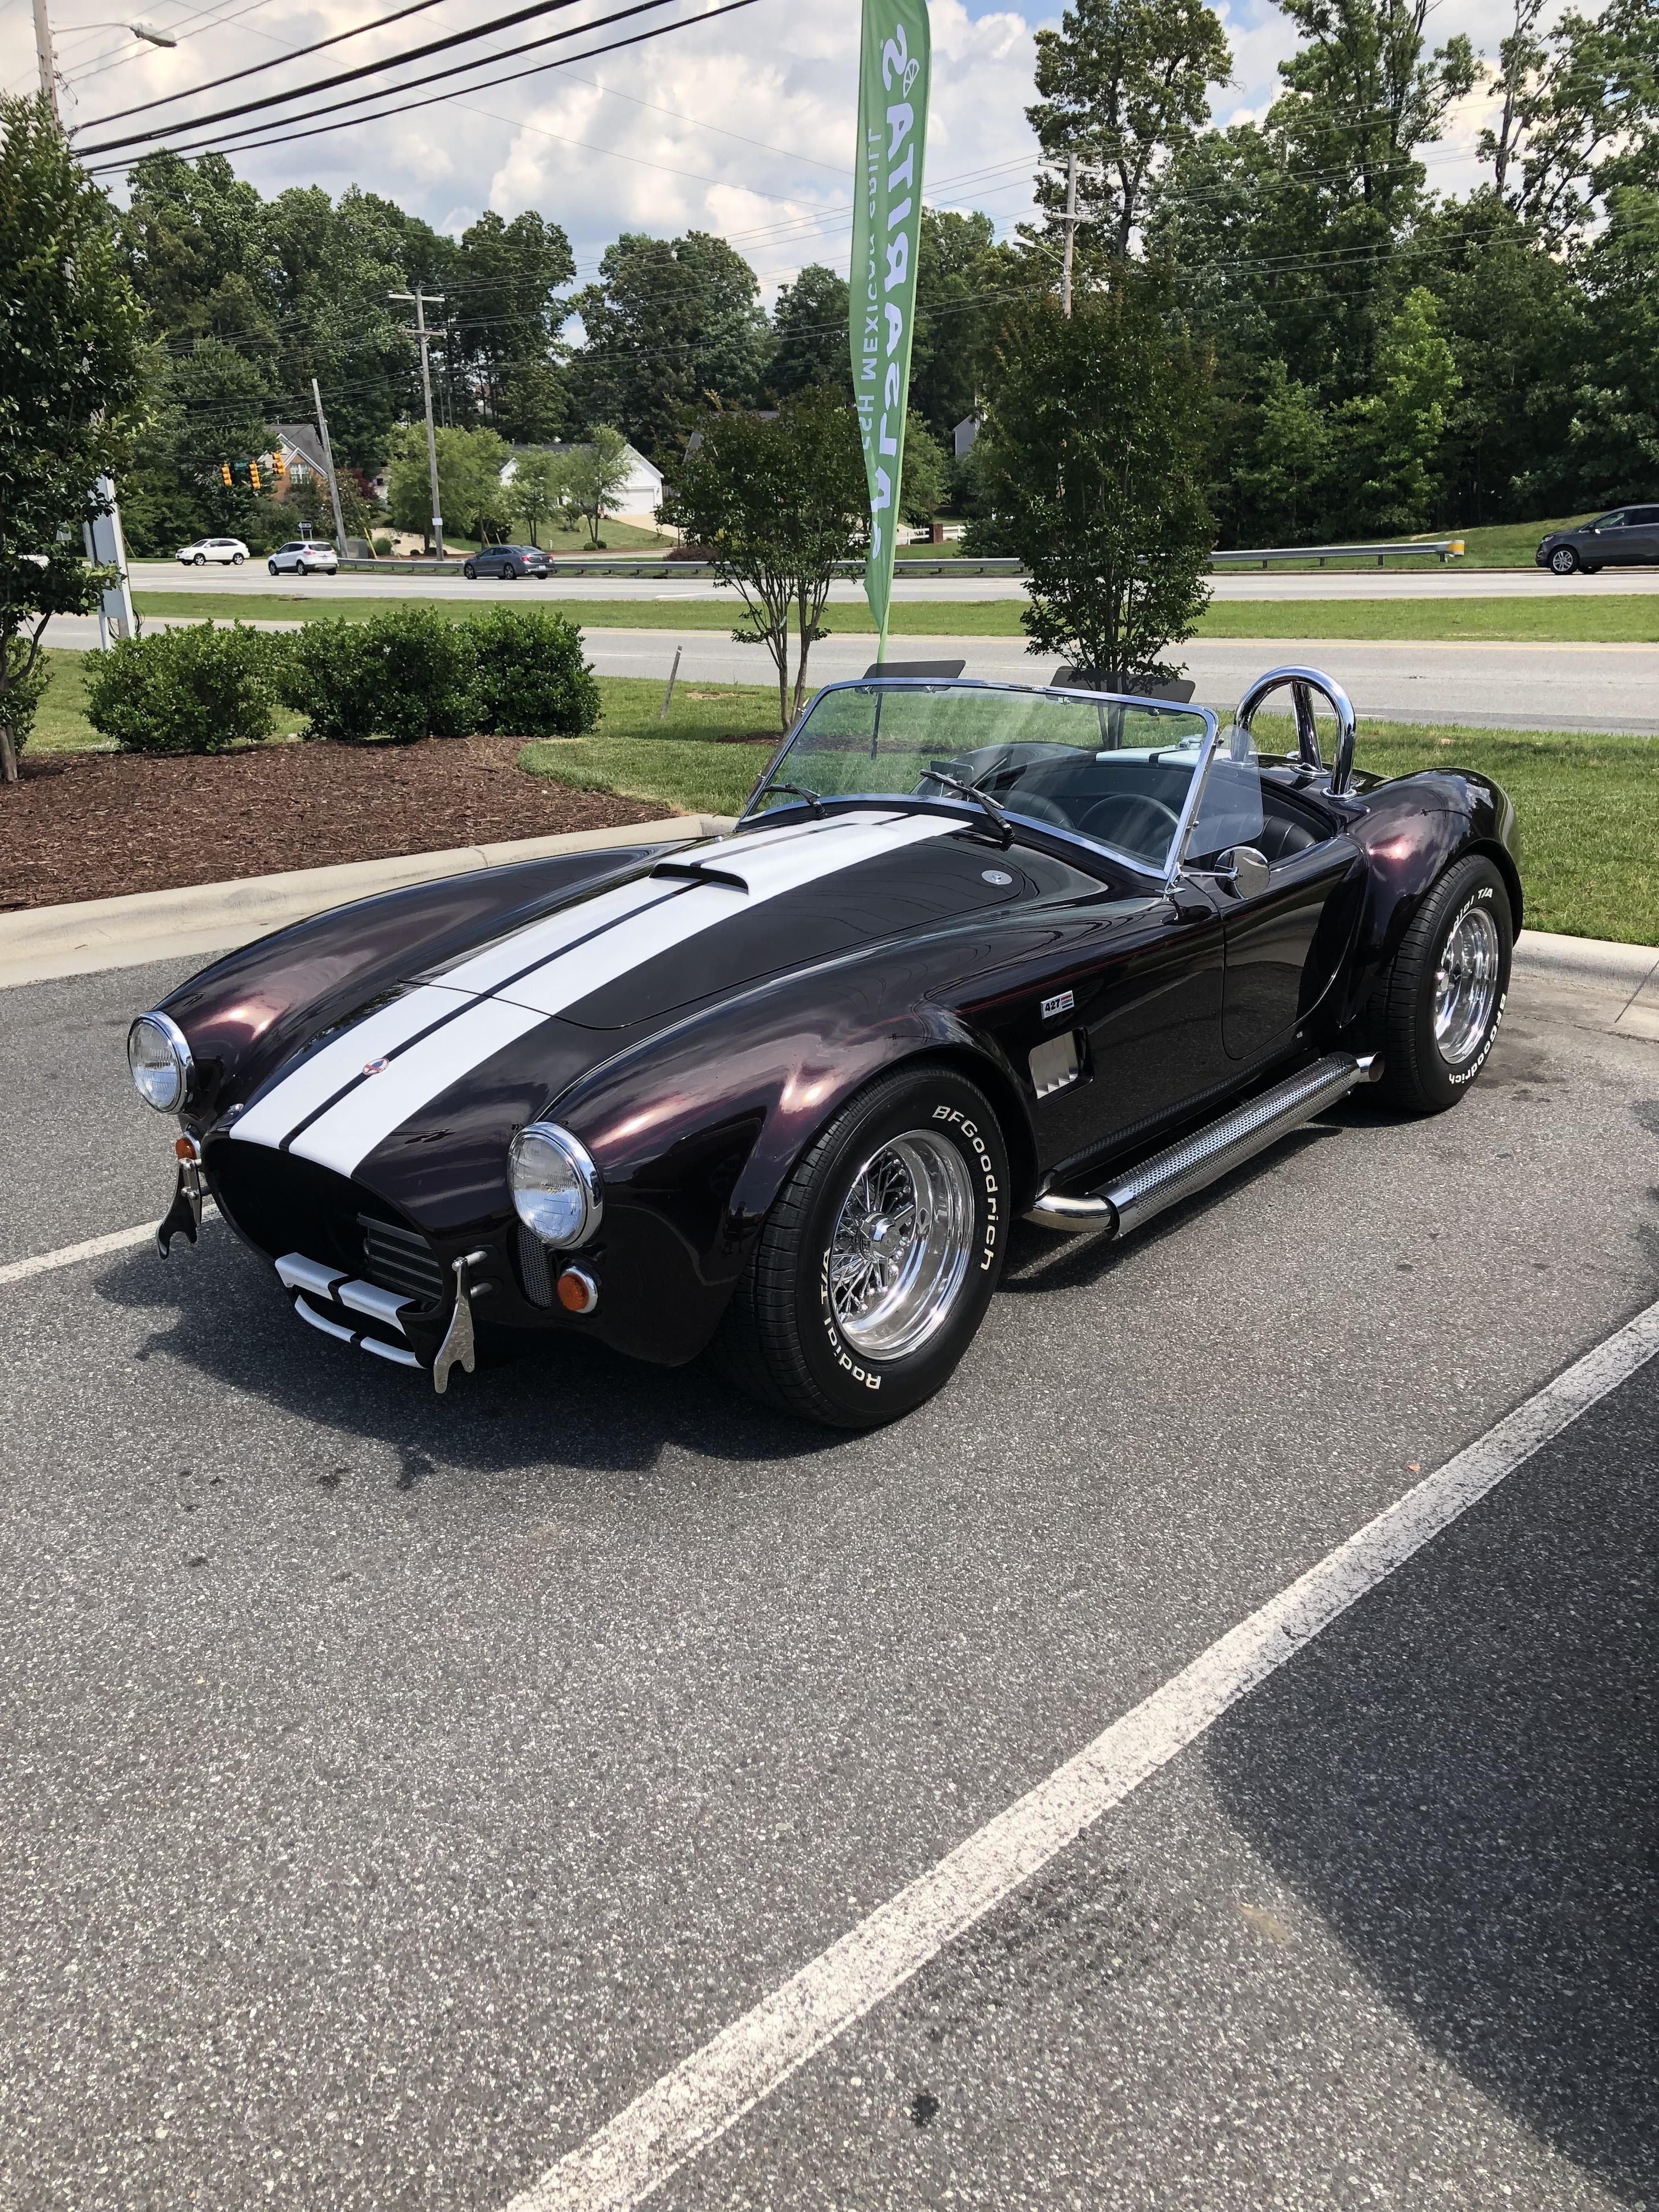 Shelby Cobra I saw driving around Cars Pinterest